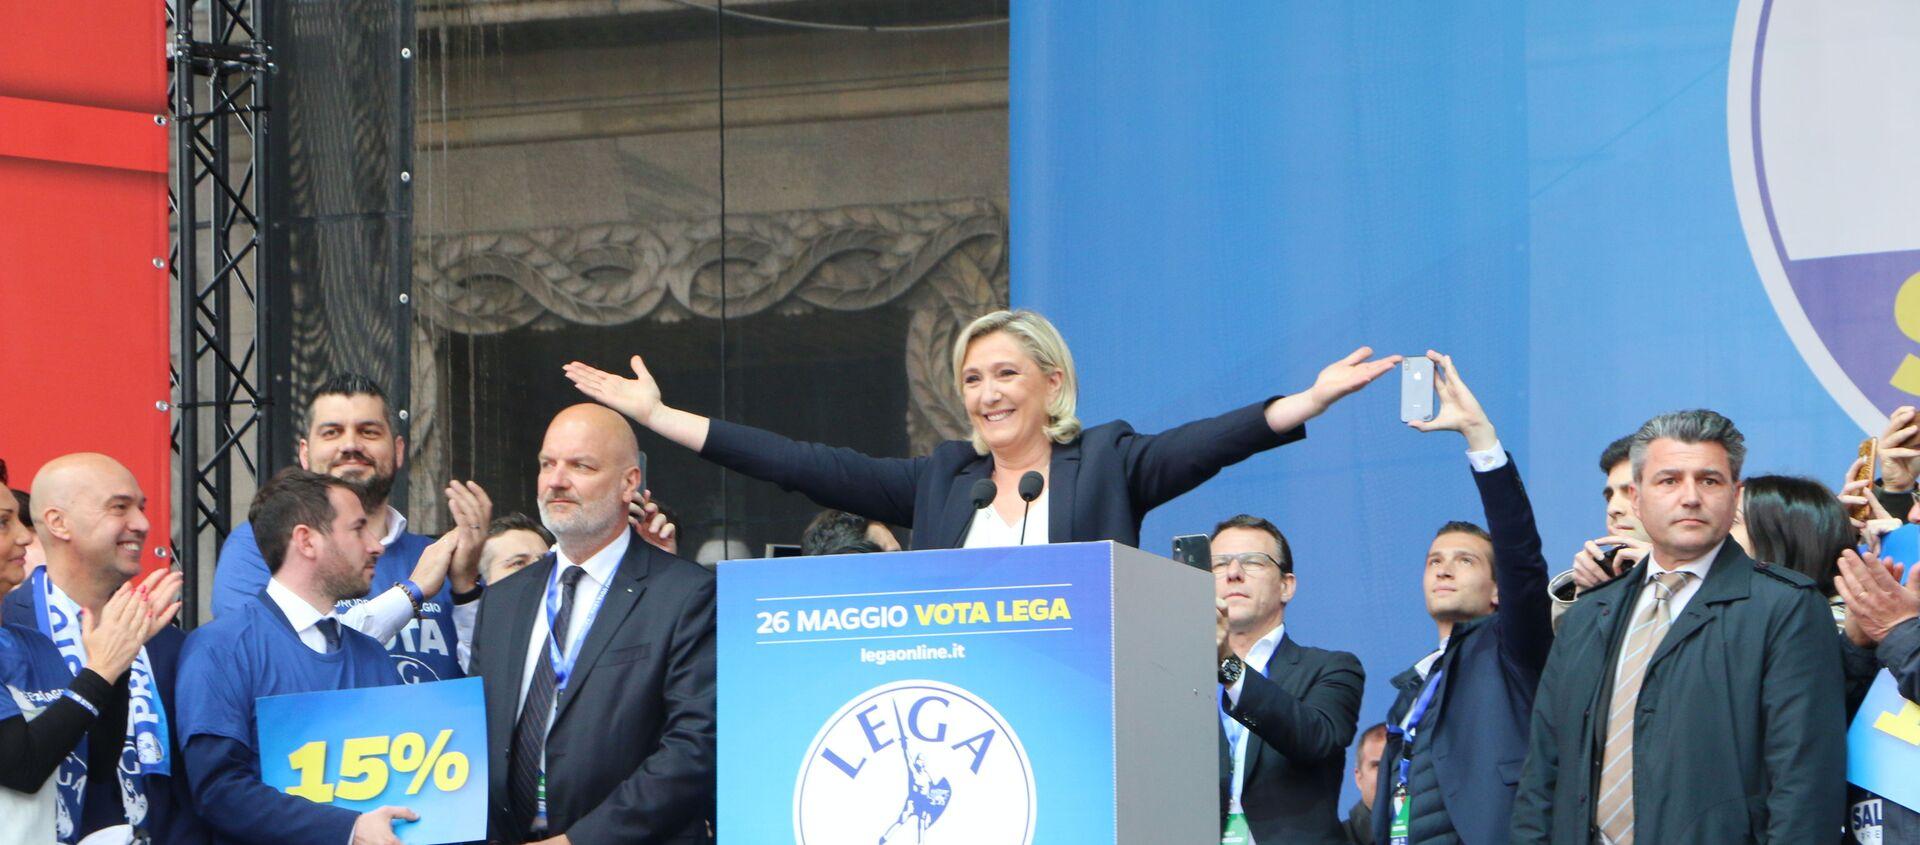 Marine Le Pen - Sputnik Italia, 1920, 30.01.2021